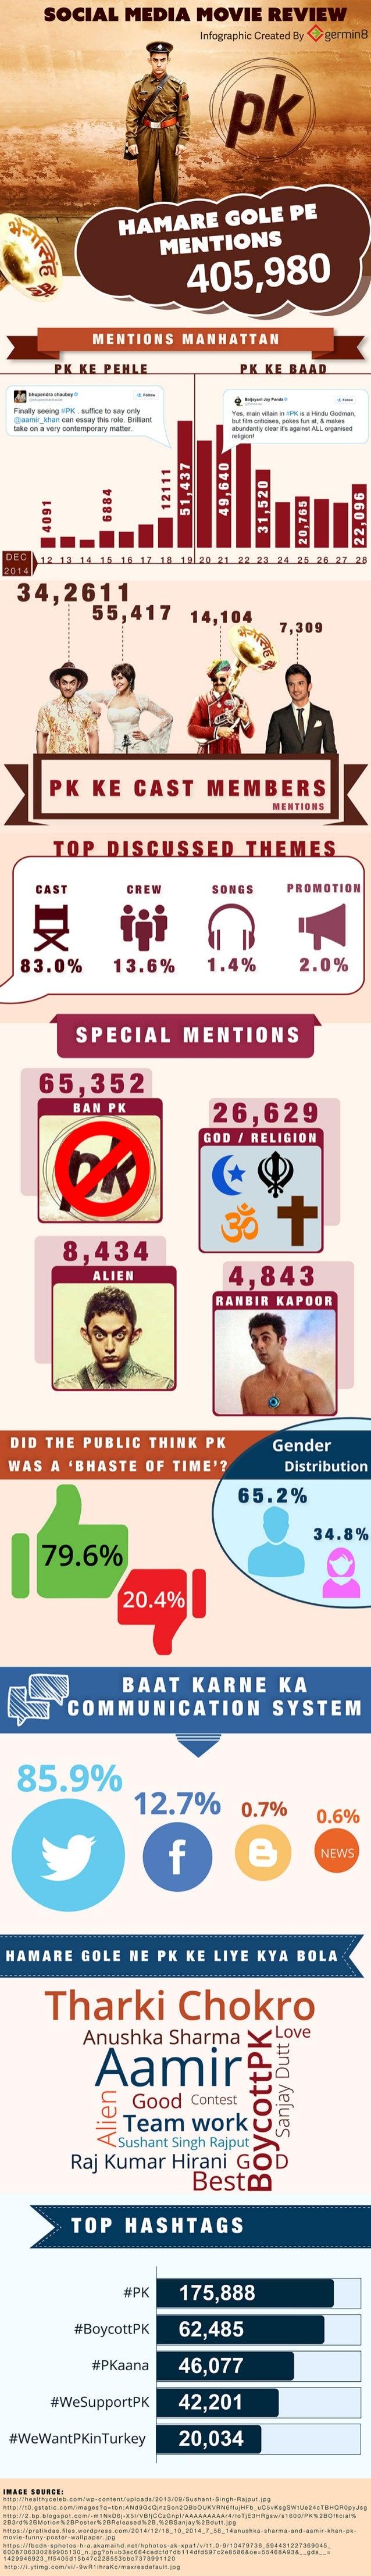 SOCIAL MEDIA MOVIE REVIEW  Infographic Created By 9 germin8  '.  bhupondra chauboyb -.9. lollow _ ti 4 - - i - '- é Balaya...